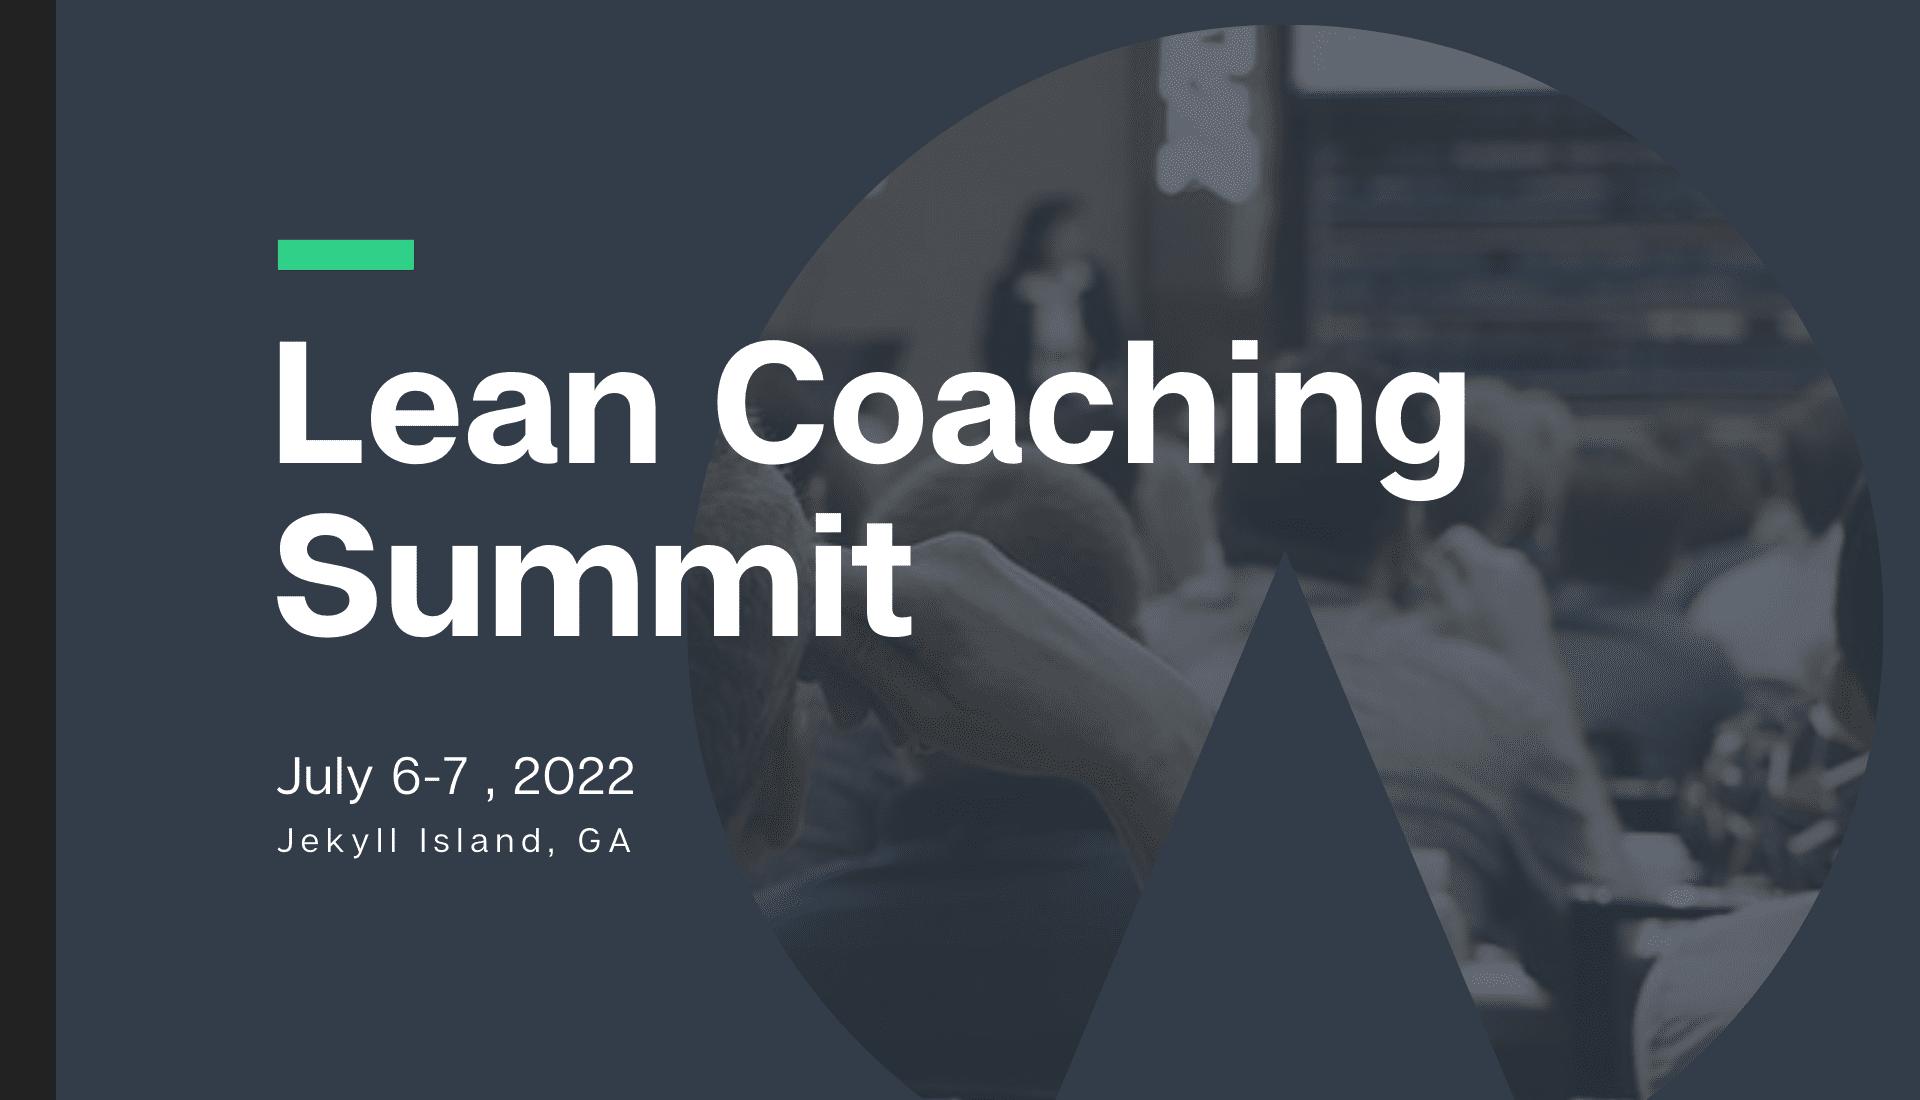 2022 Lean Coaching Summit